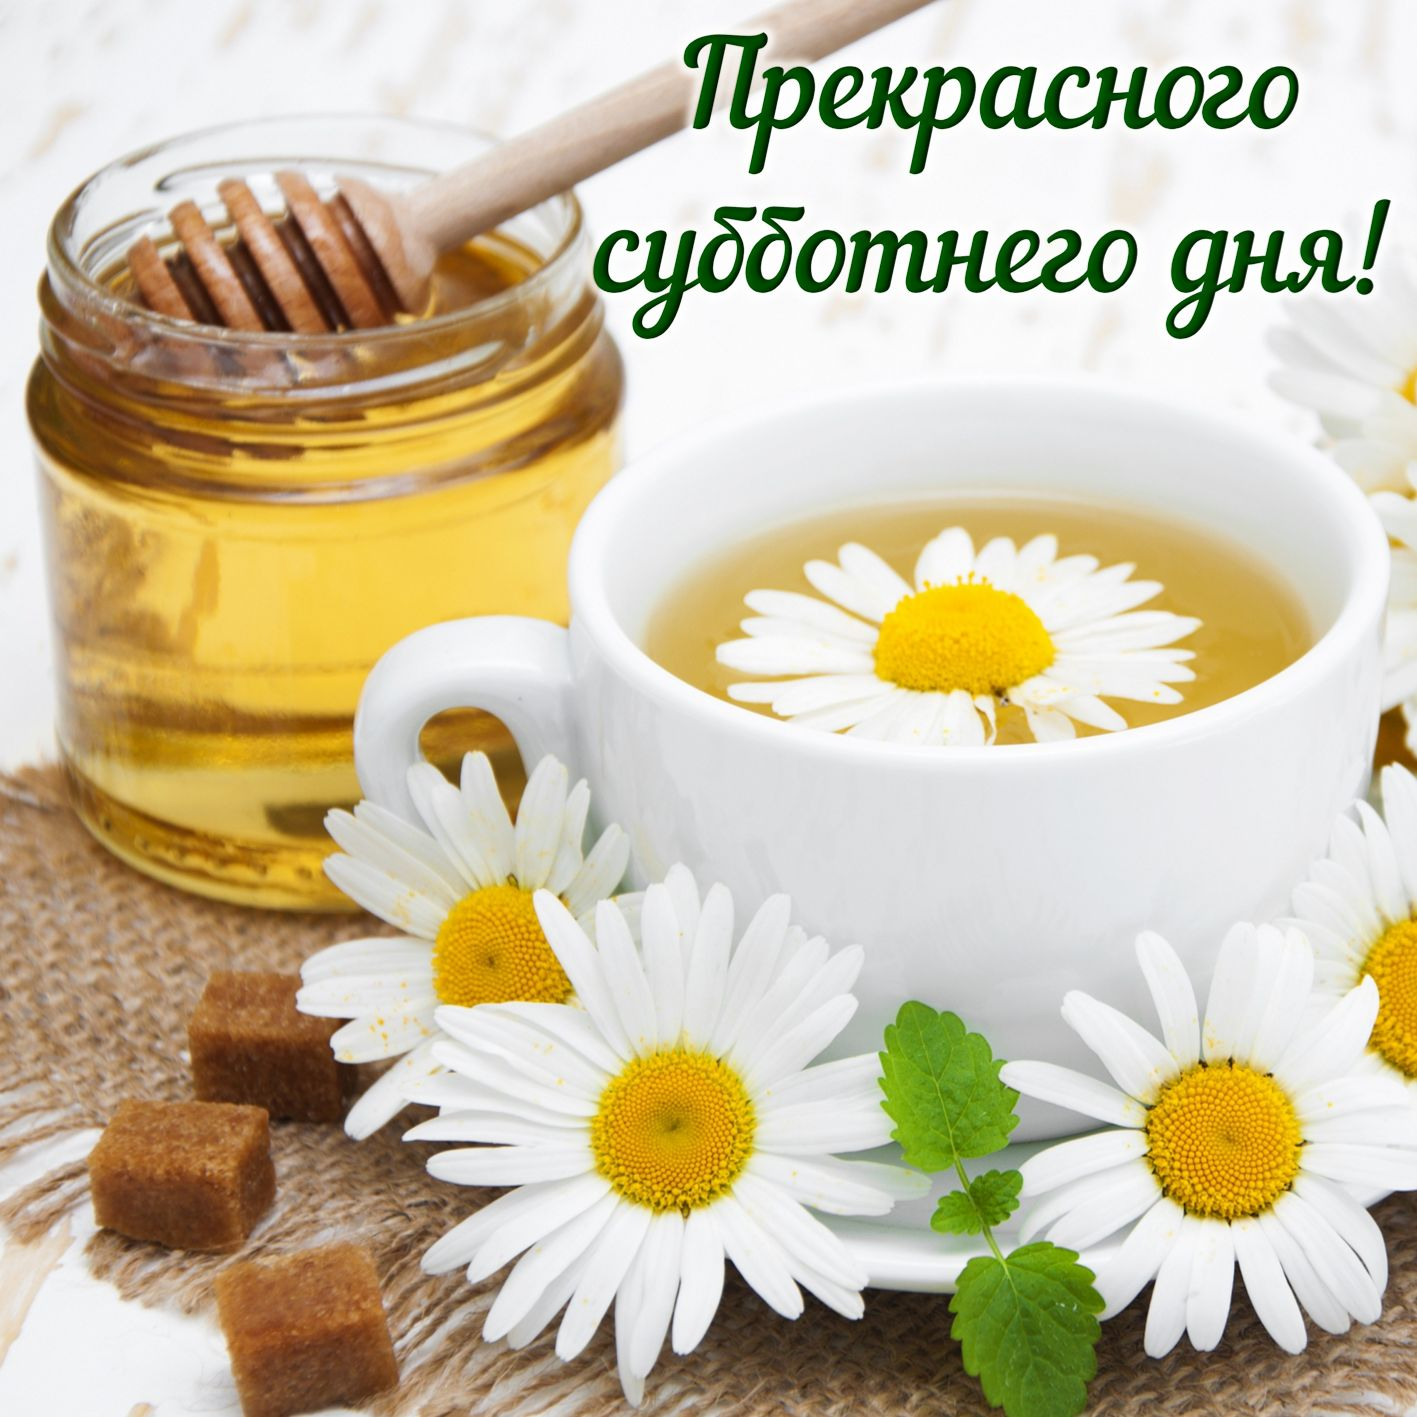 Открытка с мёдом и ромашками к субботе